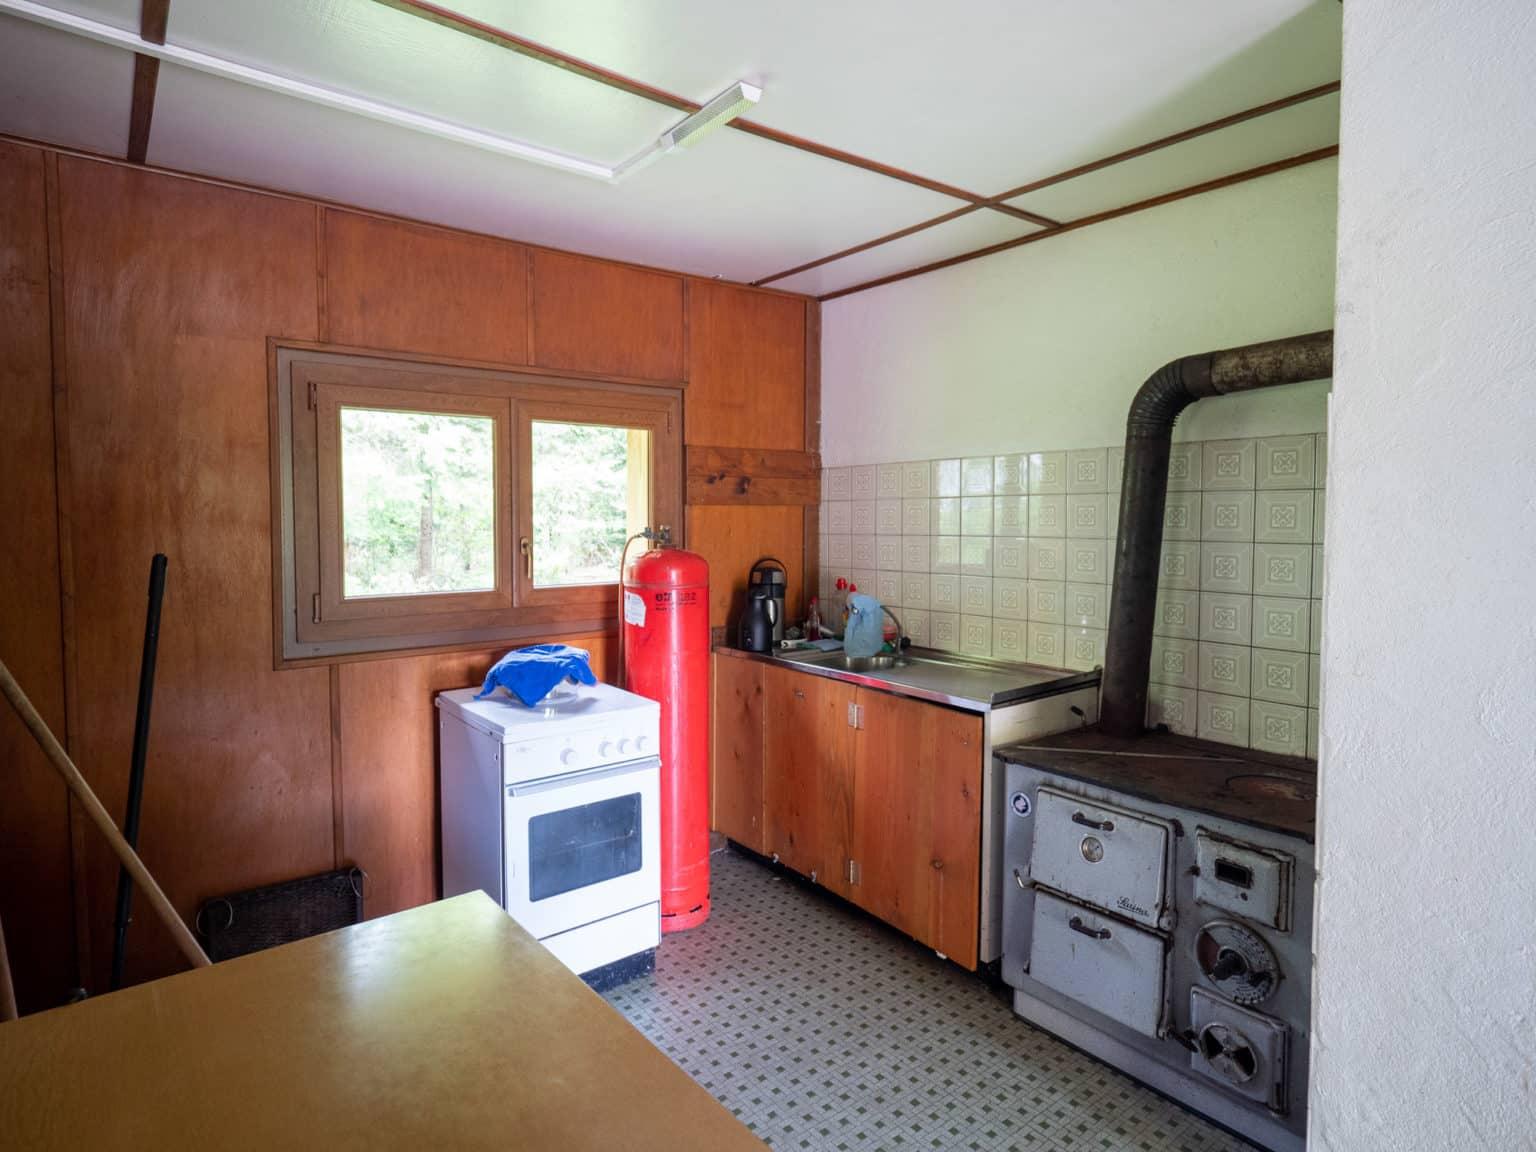 Refuges-salles-Montanaire©V-Dubach-52734